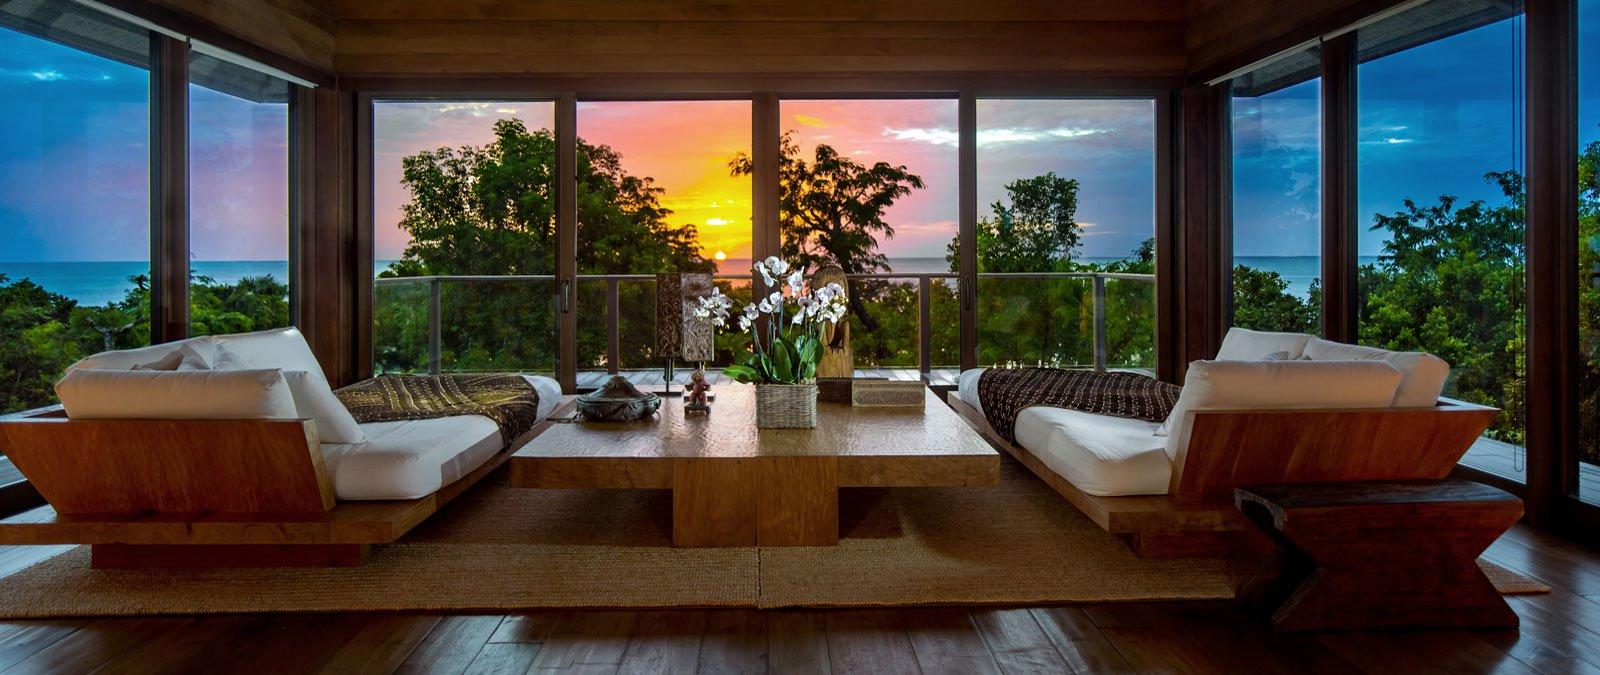 The Sanctuary, Parrot Cay, Turks & Caicos Islands